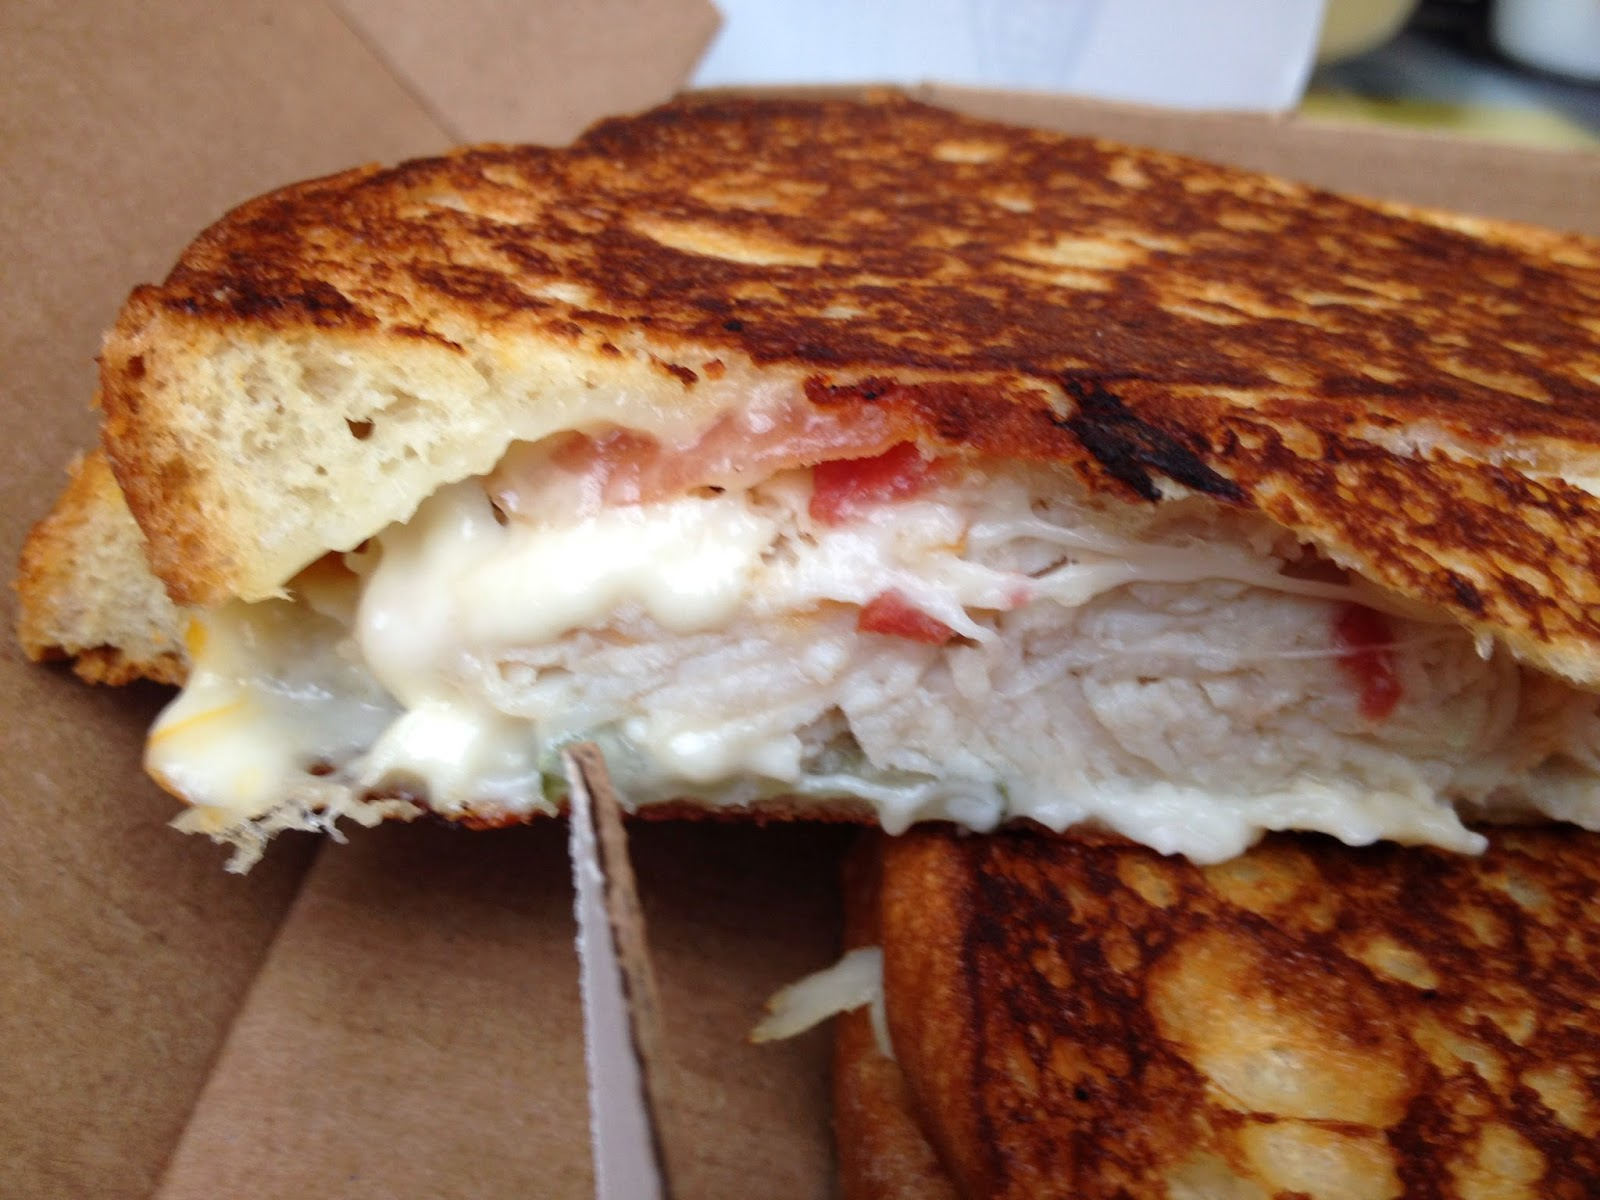 2 Dudes Who Love Food: Cheeseboy - Boston, MA